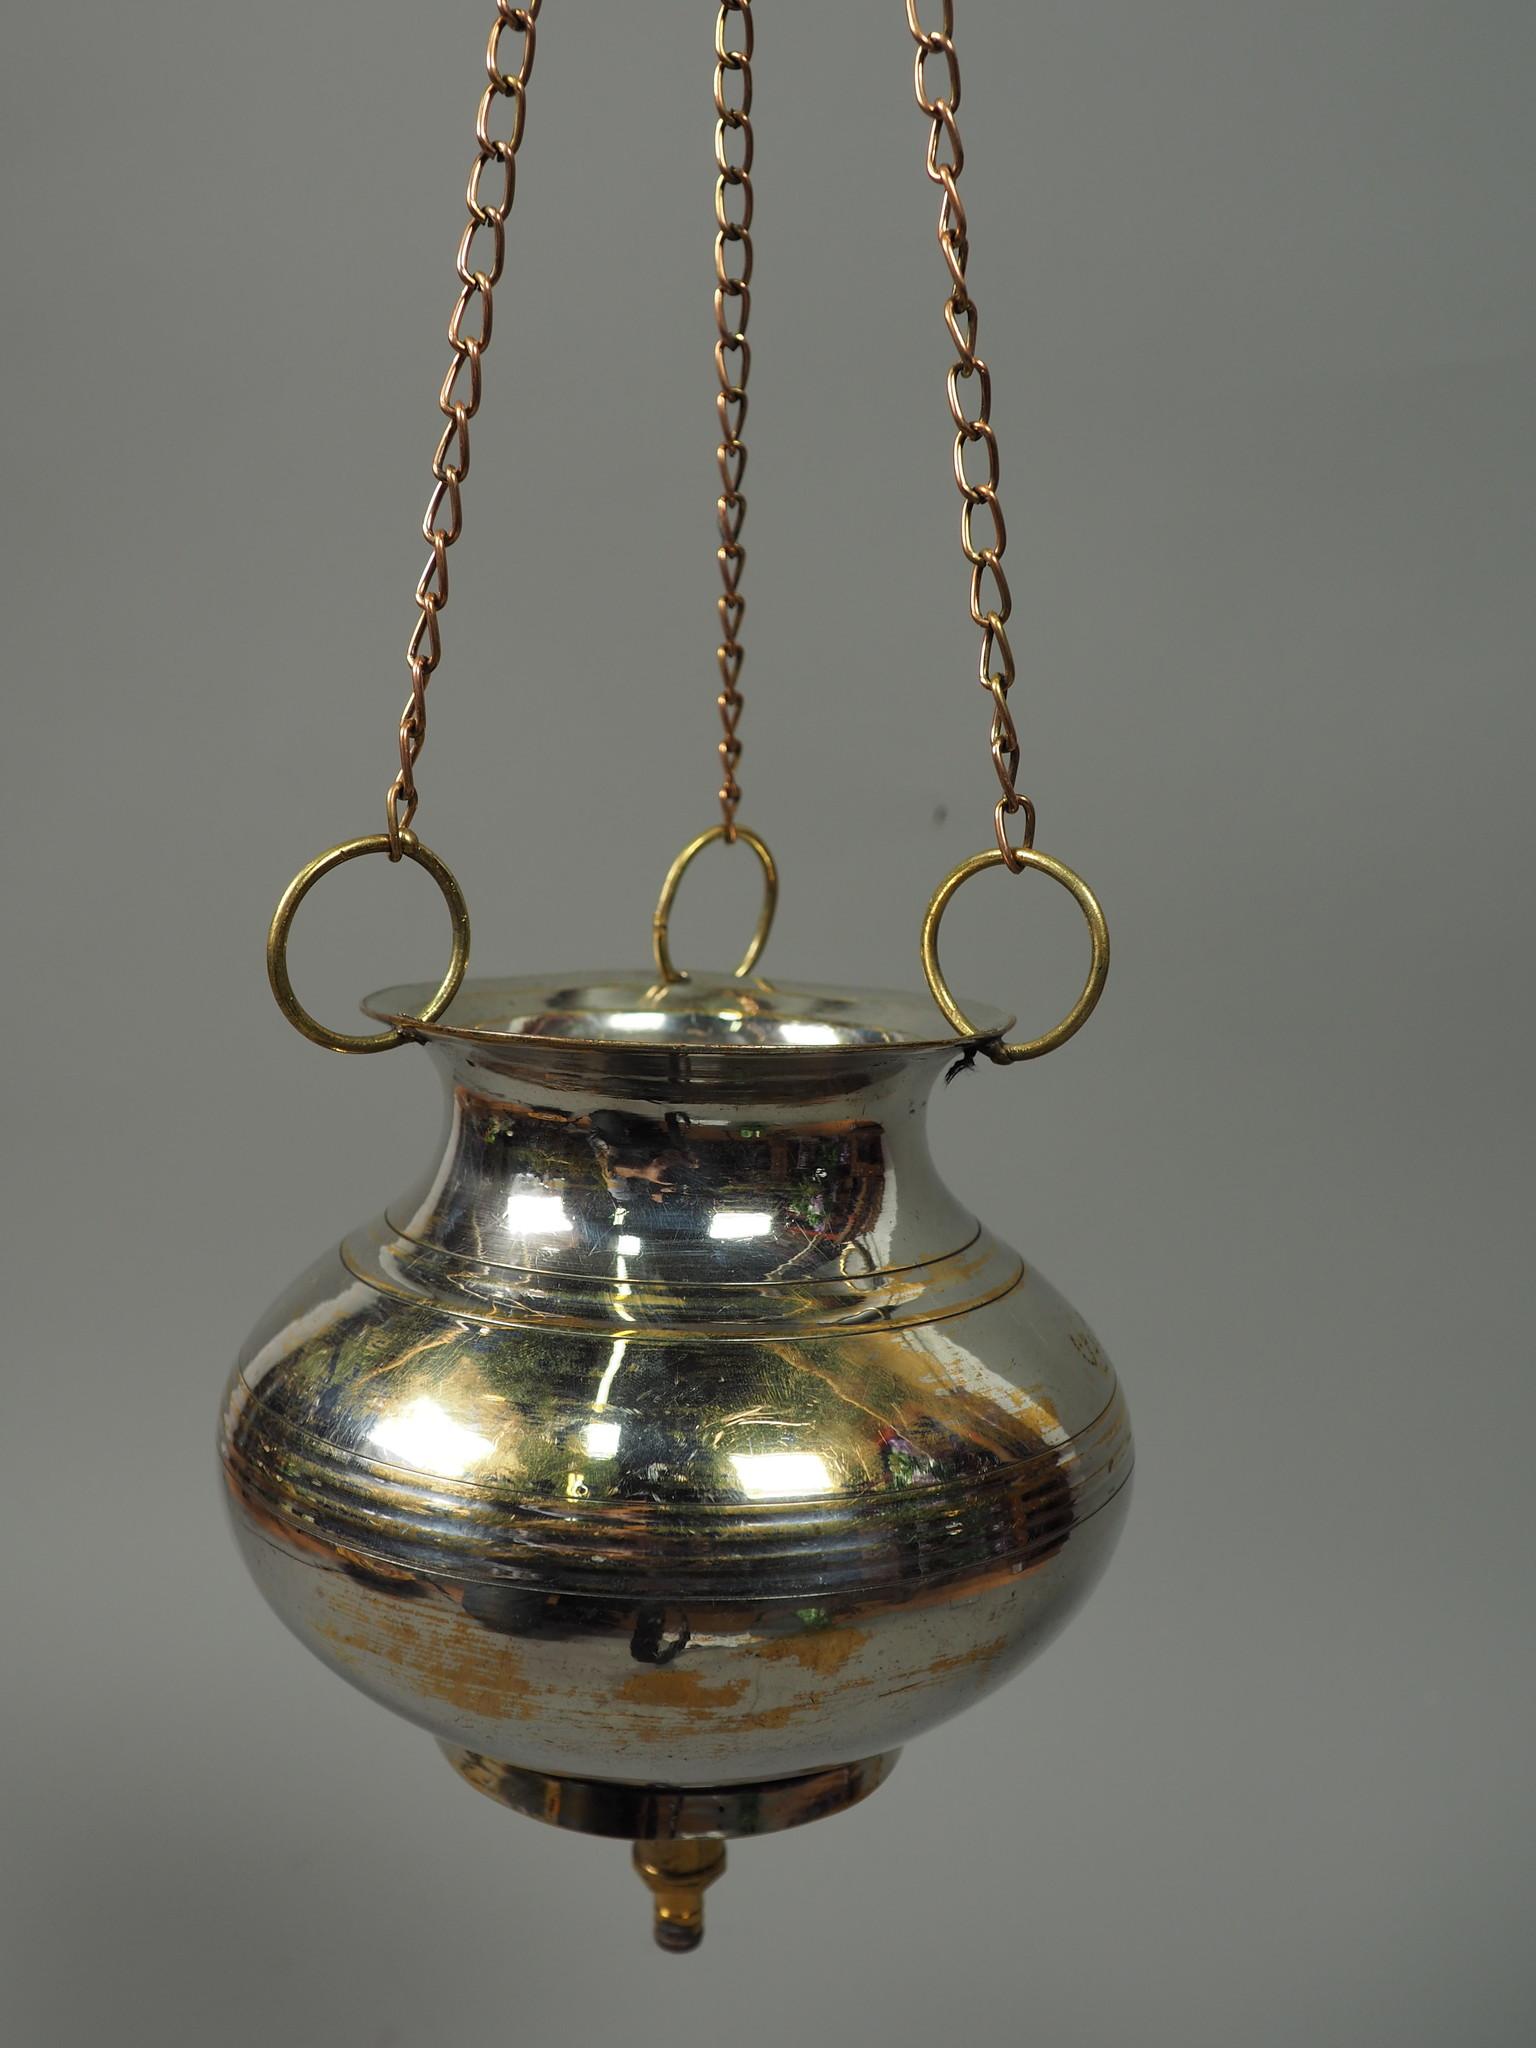 1 Liter antik orient Massiv Messing Ayurveda Shirodhara Stirnguss Stirnölguss öl-Therapie Panchakarma Yoga Dhara Vessel gefäß -Nr: 21/ 20